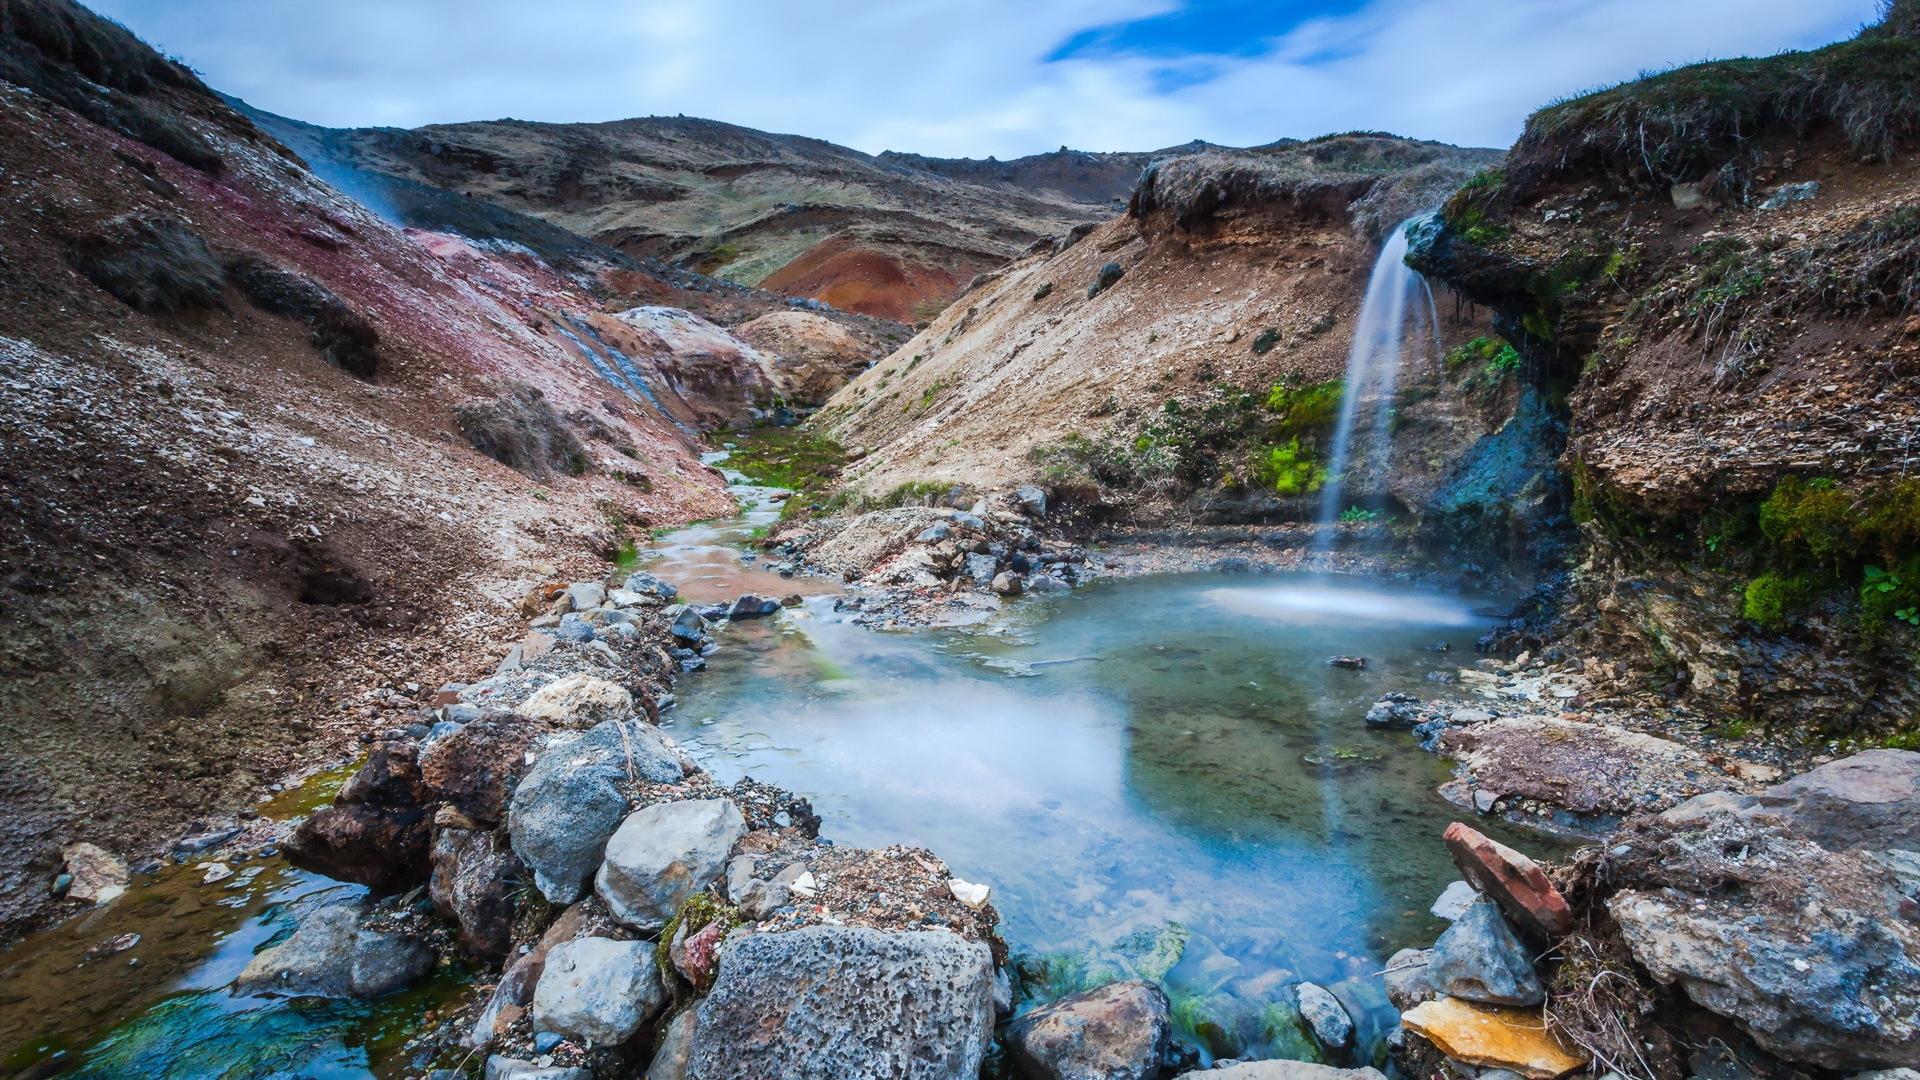 Wallpaper 1920x1080 River Rocks Nature Full HD 1080p HD Background 1920x1080